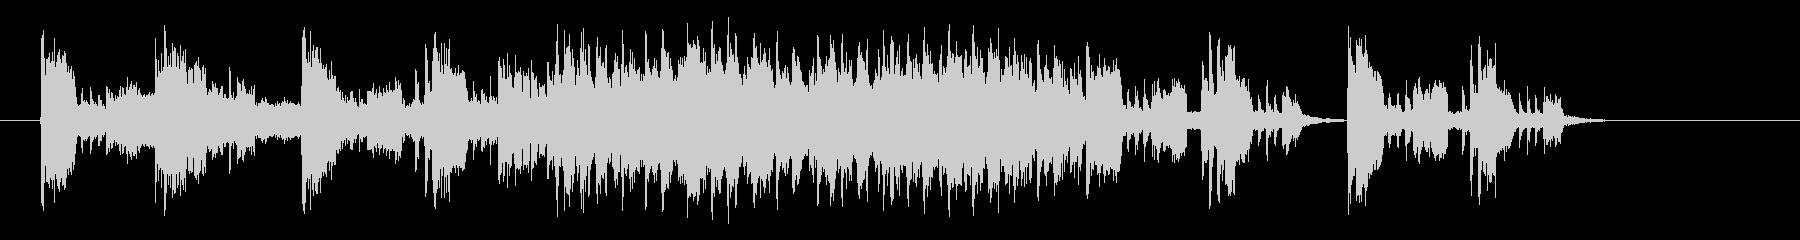 Mechanical techno pops's unreproduced waveform